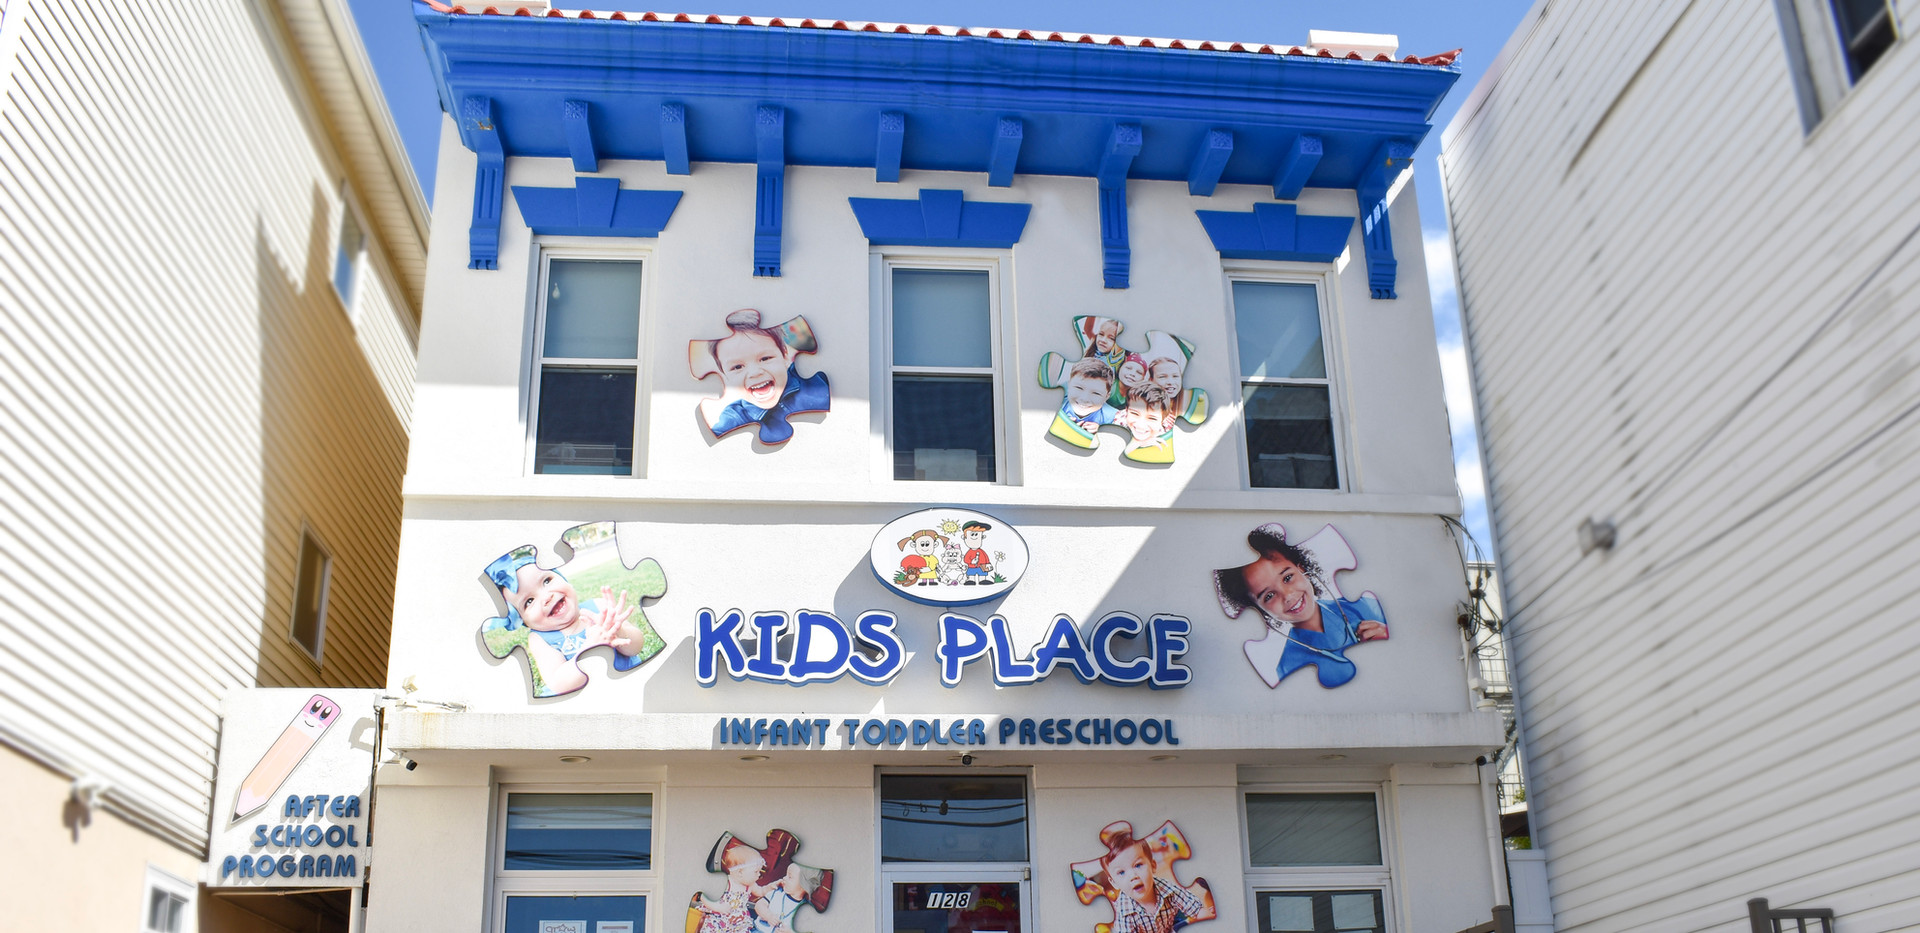 Kids Place no cables.jpg